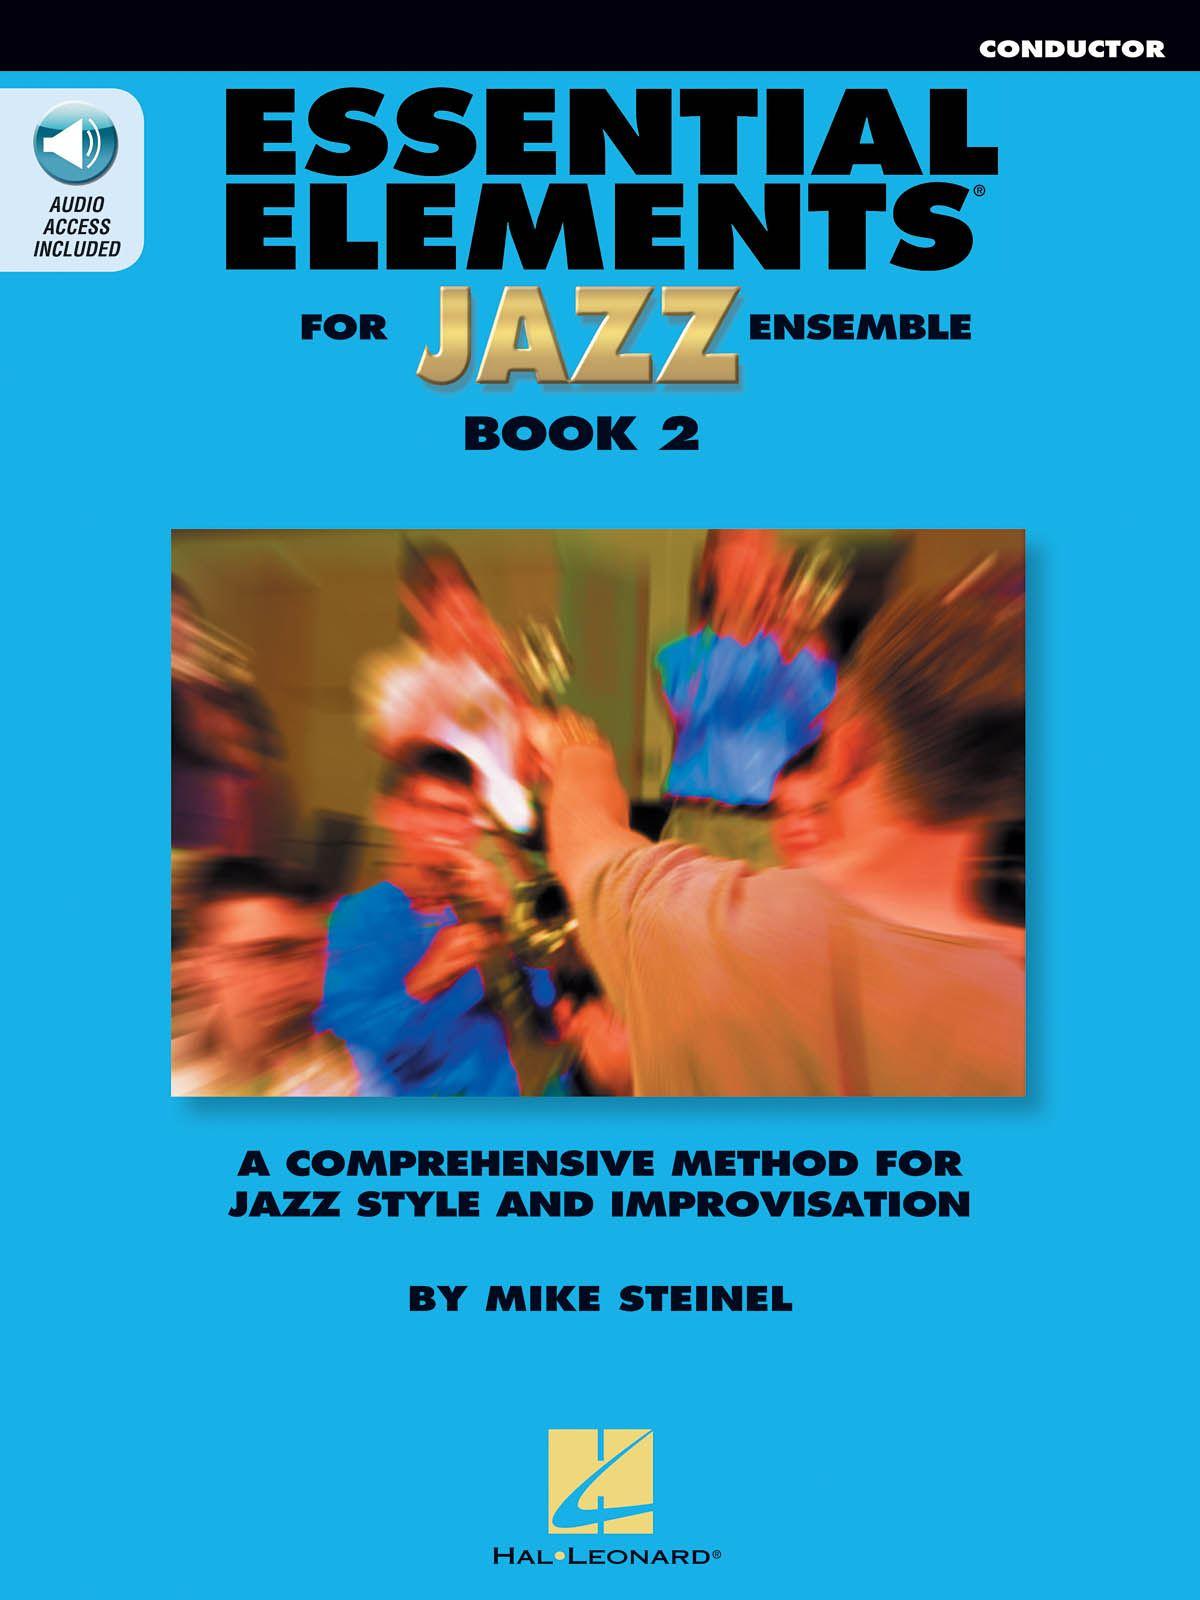 Essential Elements for Jazz Ensemble Book 2: Jazz Ensemble: Score